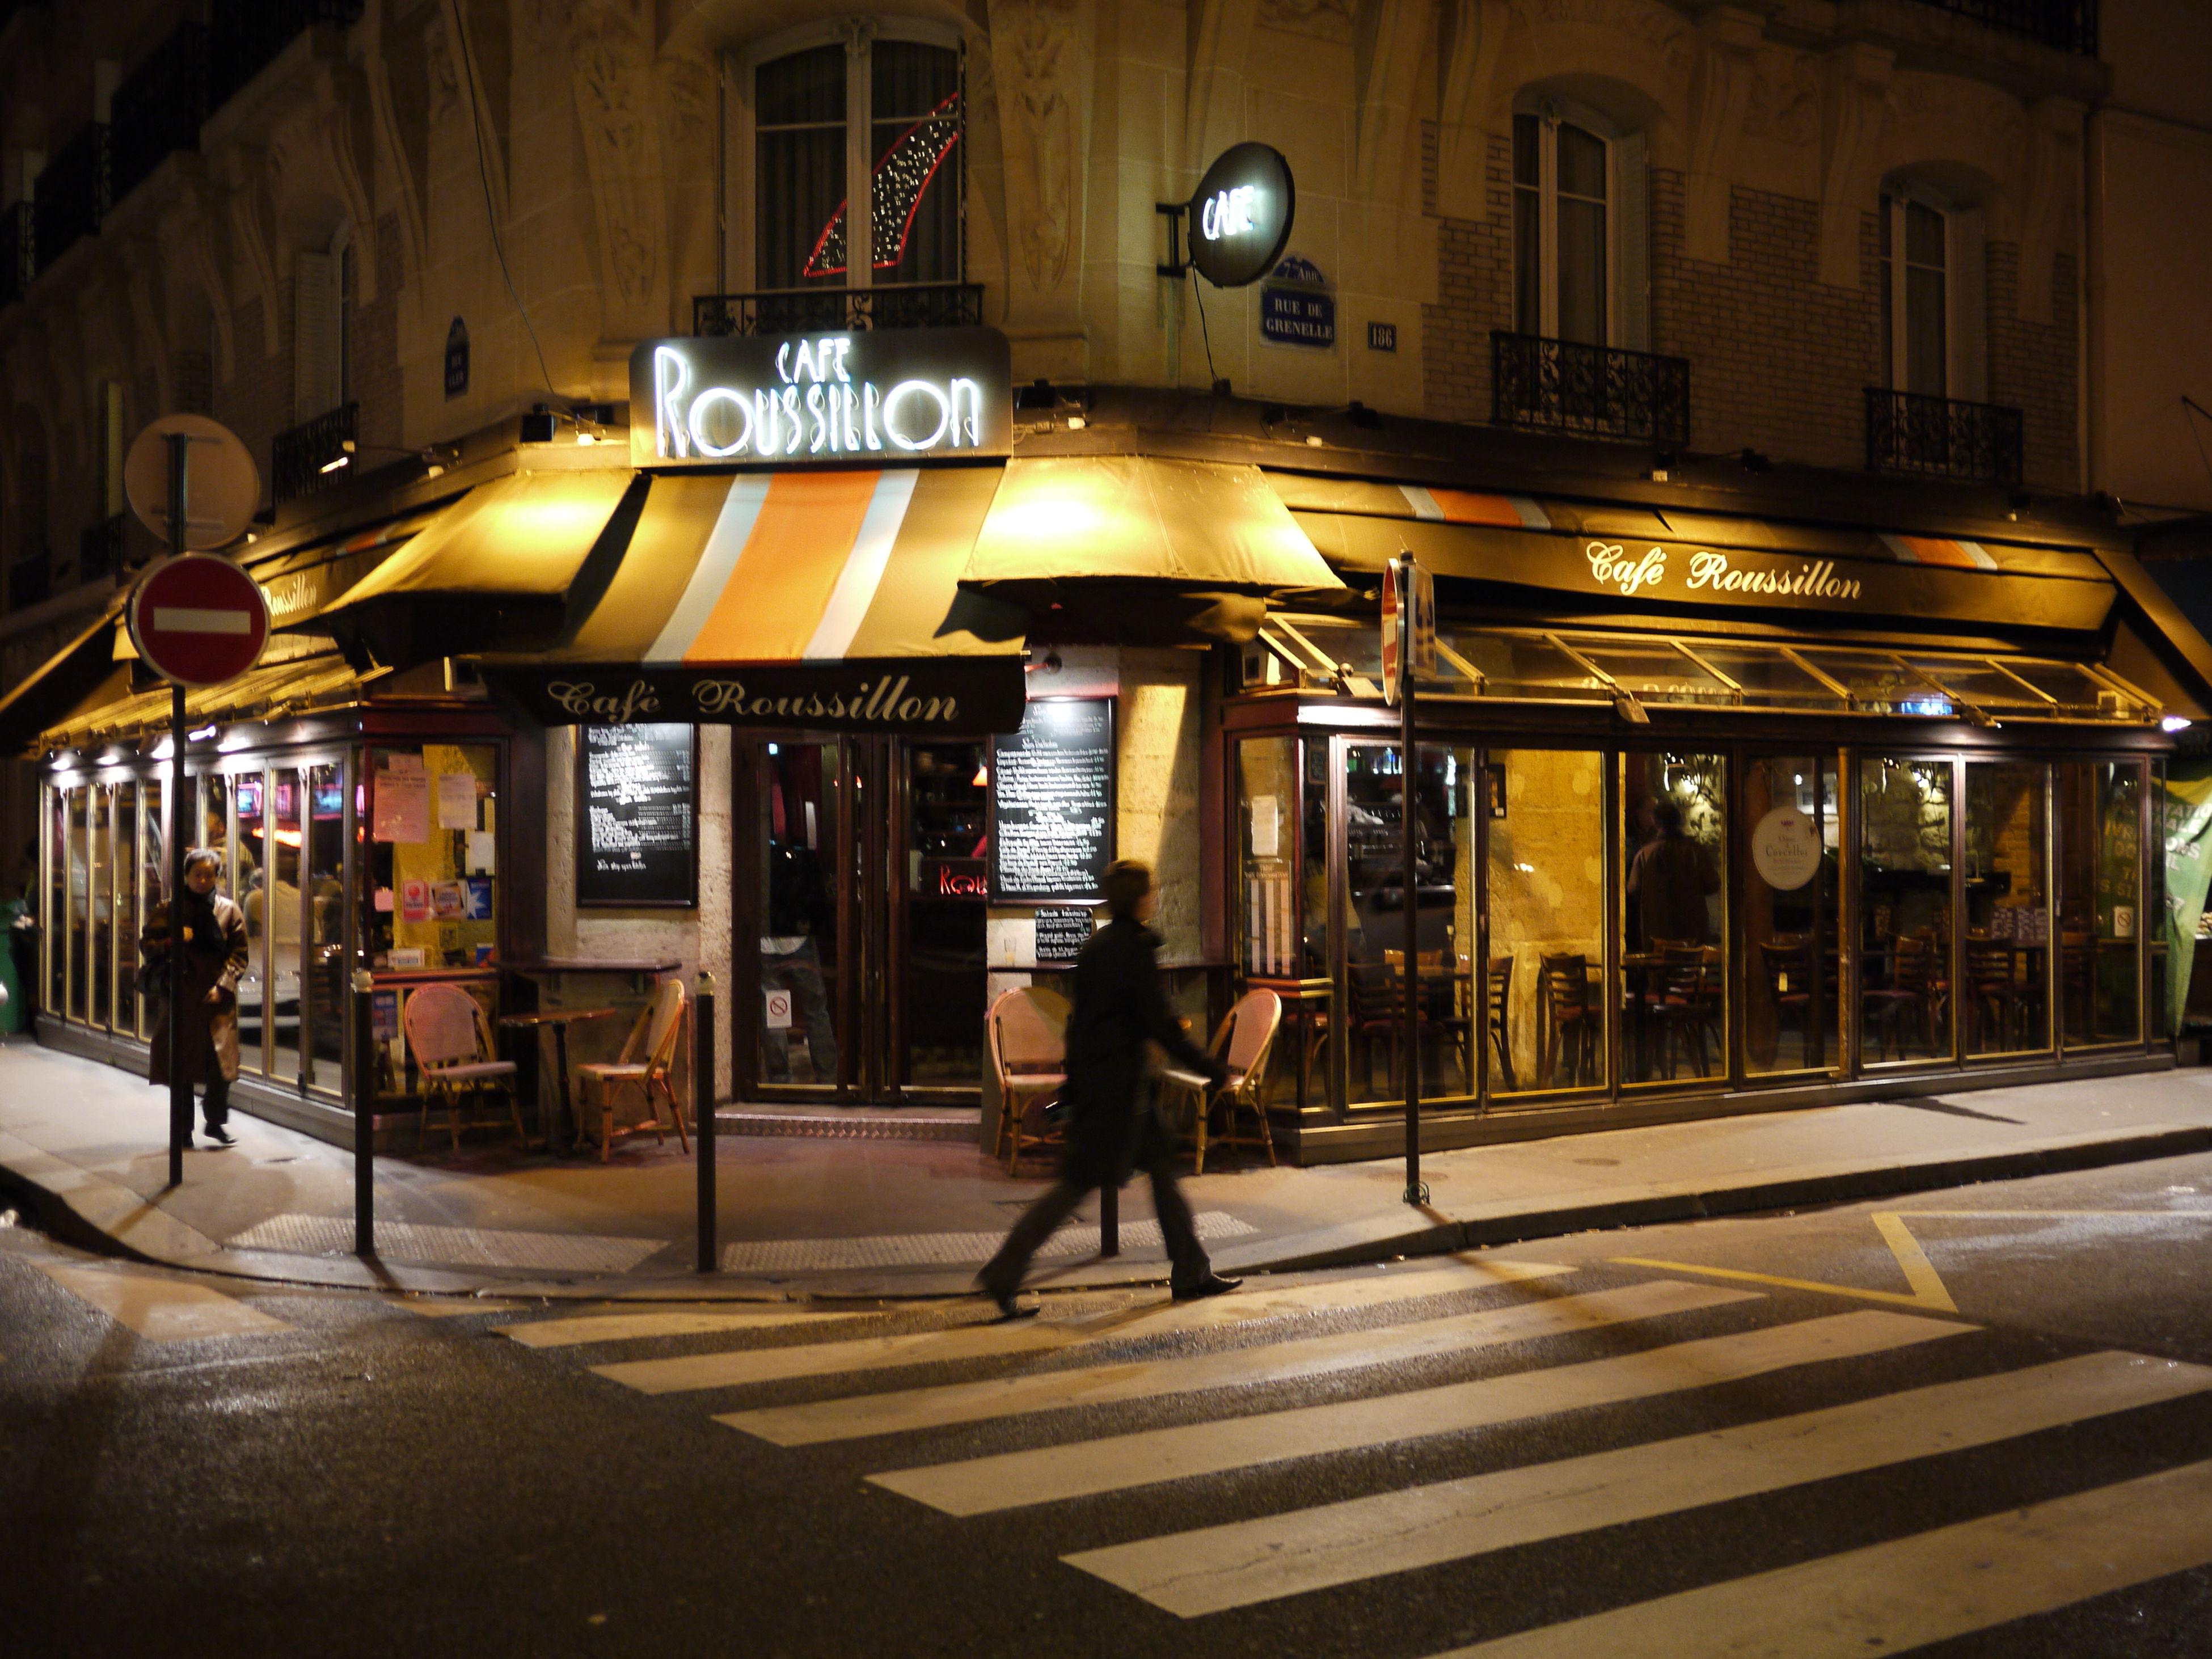 Bar Roussillon City Communication Crosswalk Illuminated Paris ❤ People